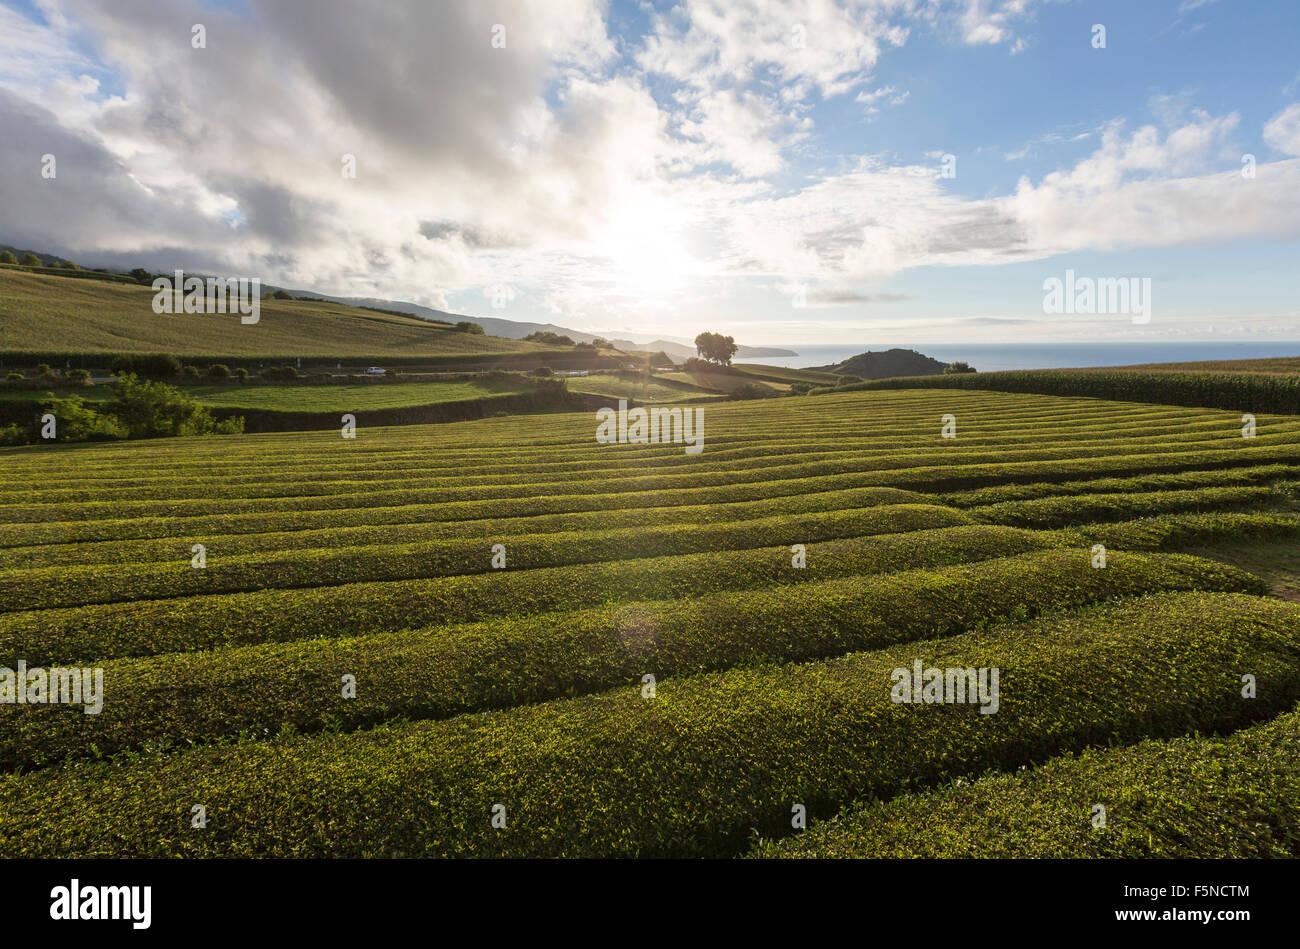 plantacoes-de-cha-gorreana-gorreana-tea-plantation-maia-sao-miguel-F5NCTM.jpg